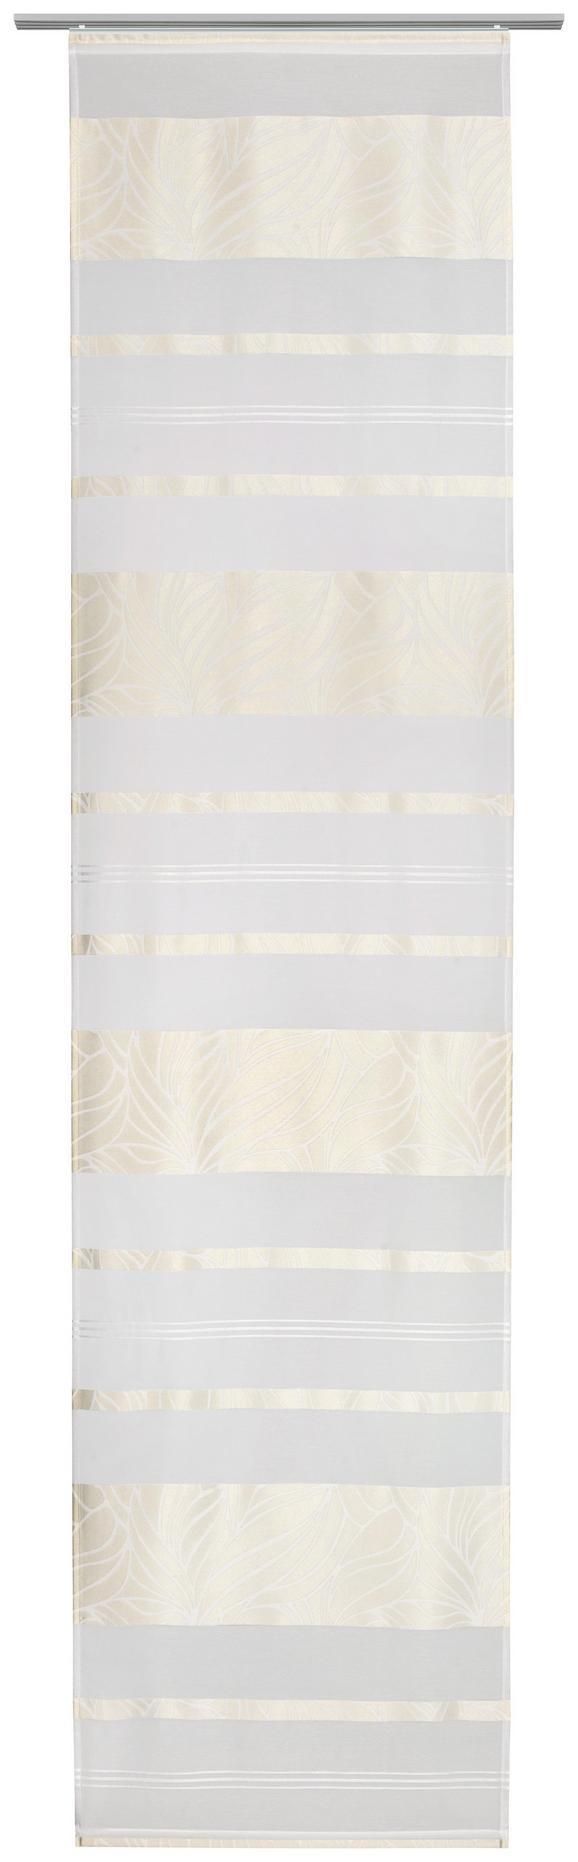 Flächenvorhang Anita Beige - Beige, Textil (60/245cm) - Modern Living